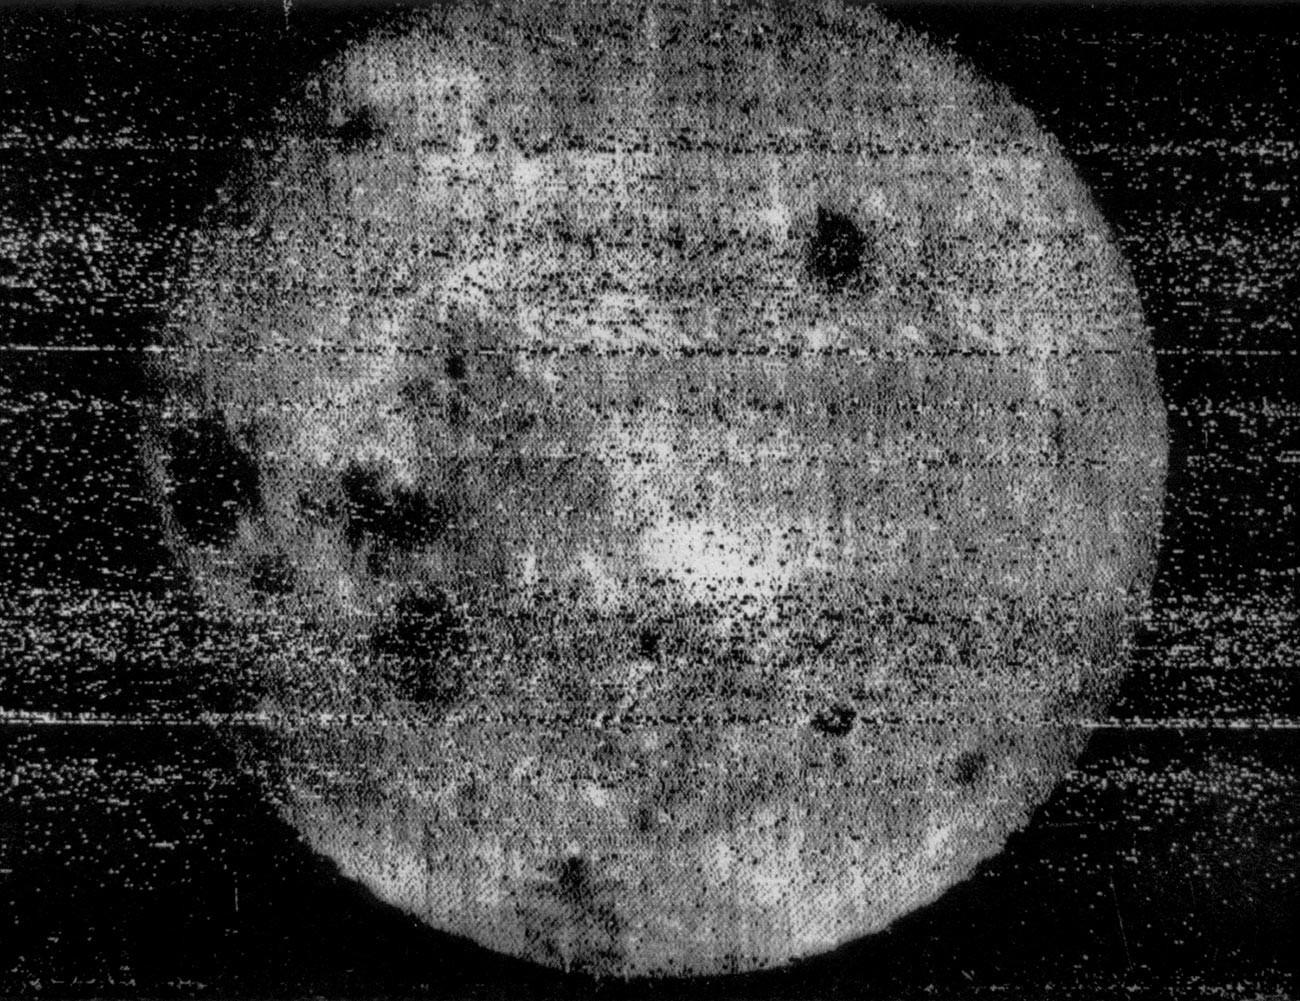 Prva fotografija oddaljene strani Lune (Luna-3, 1959)